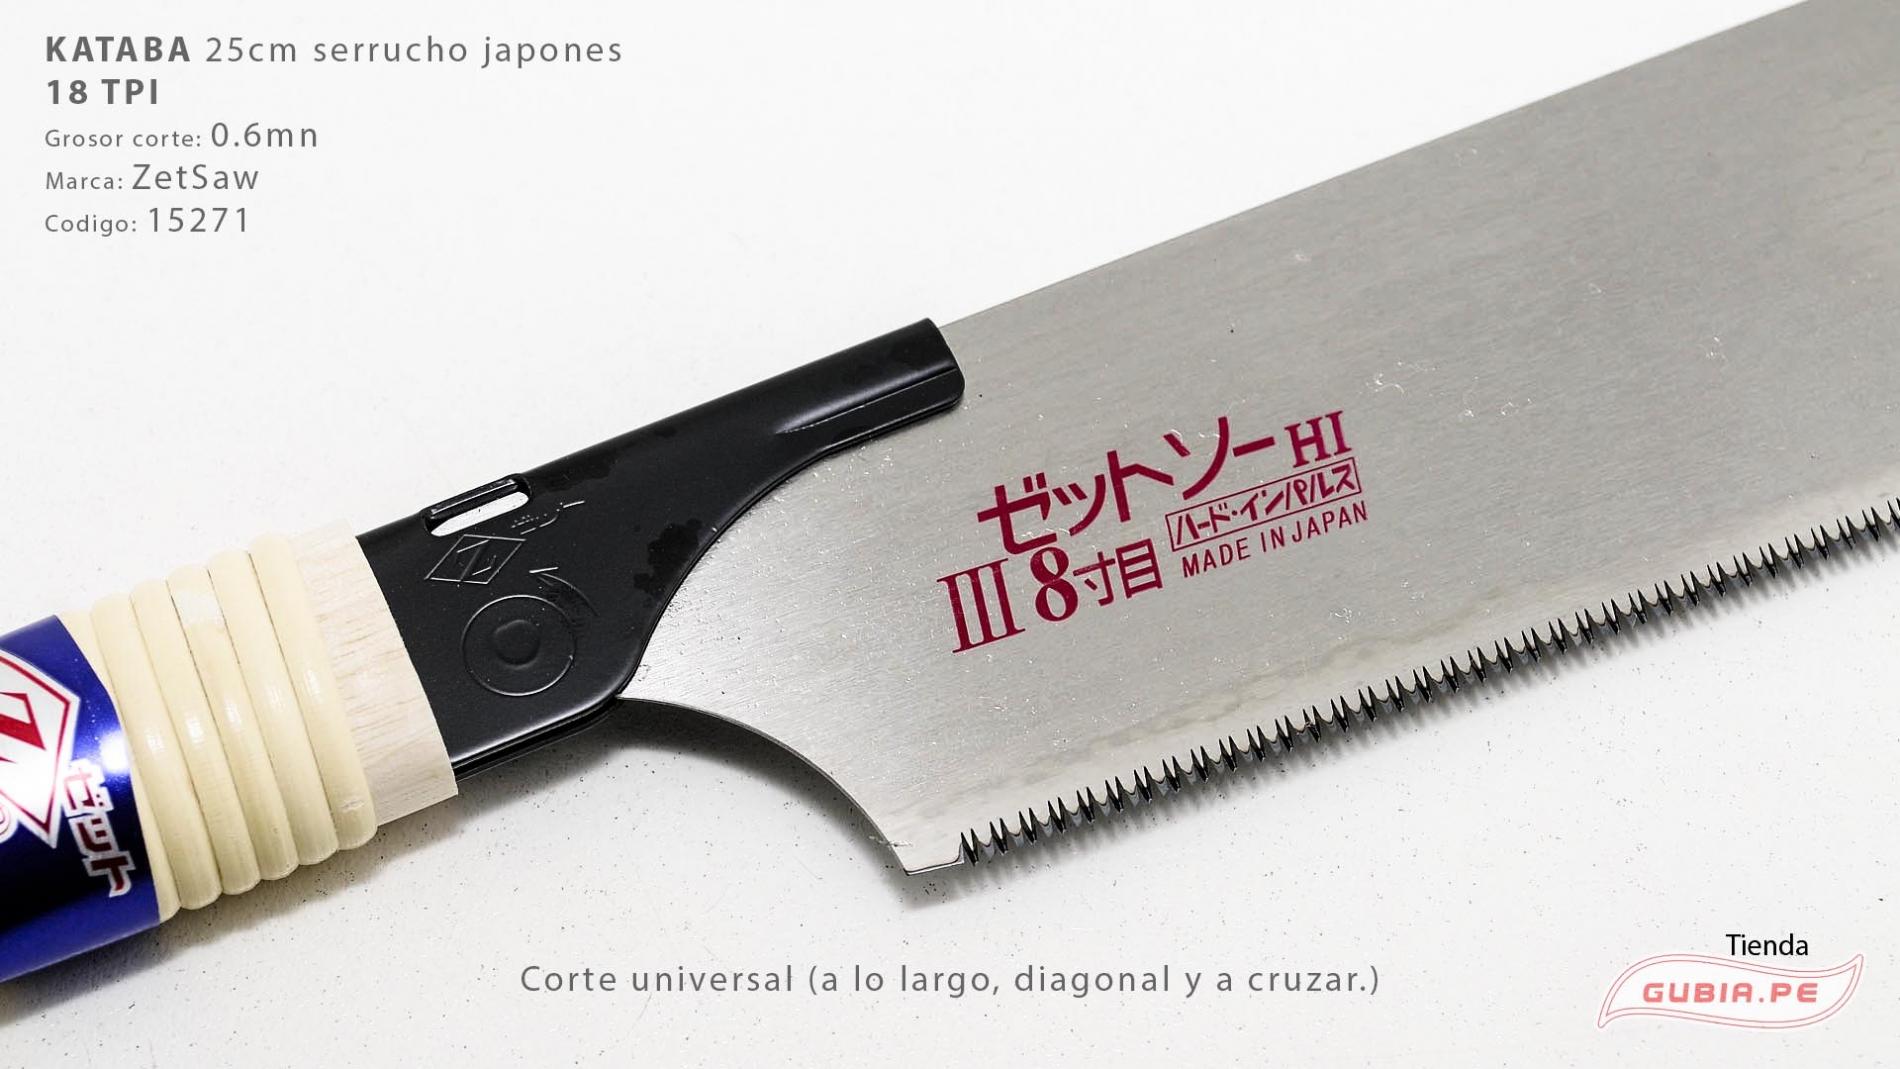 15271-Kataba 18TPI corte universal 25cm ZetSaw 15271-max-1.